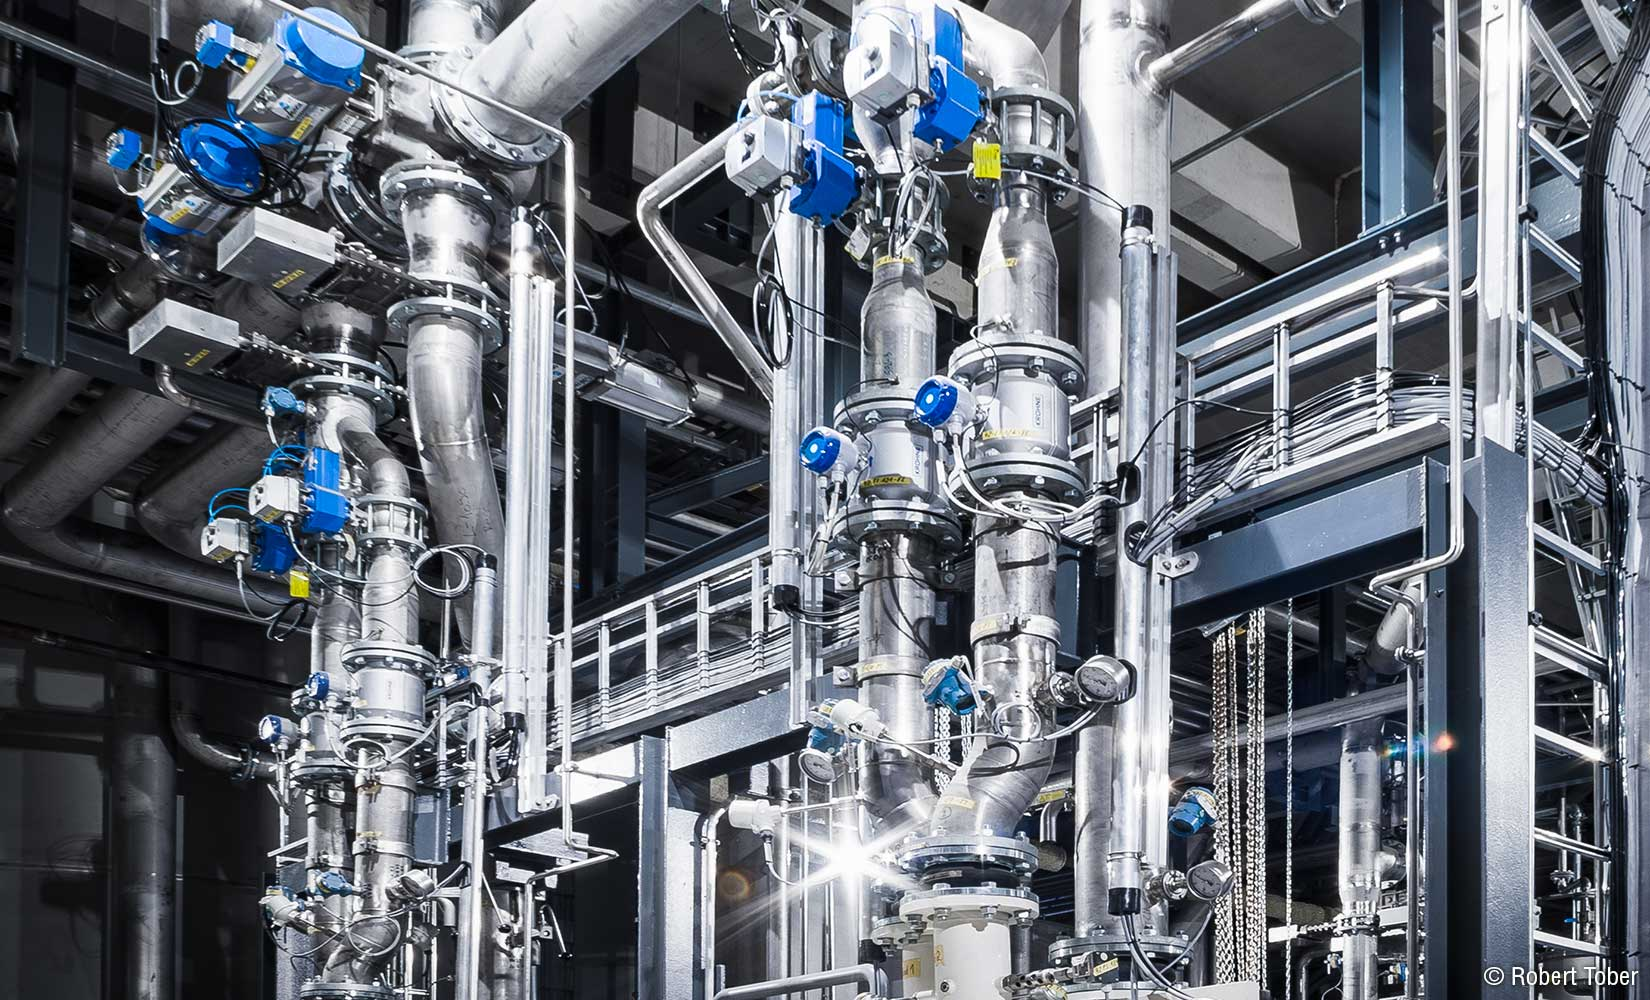 Industrieverrohrung aus nichtrostendem Edelstahl bei Zellstoff Pöls © Robert Tober